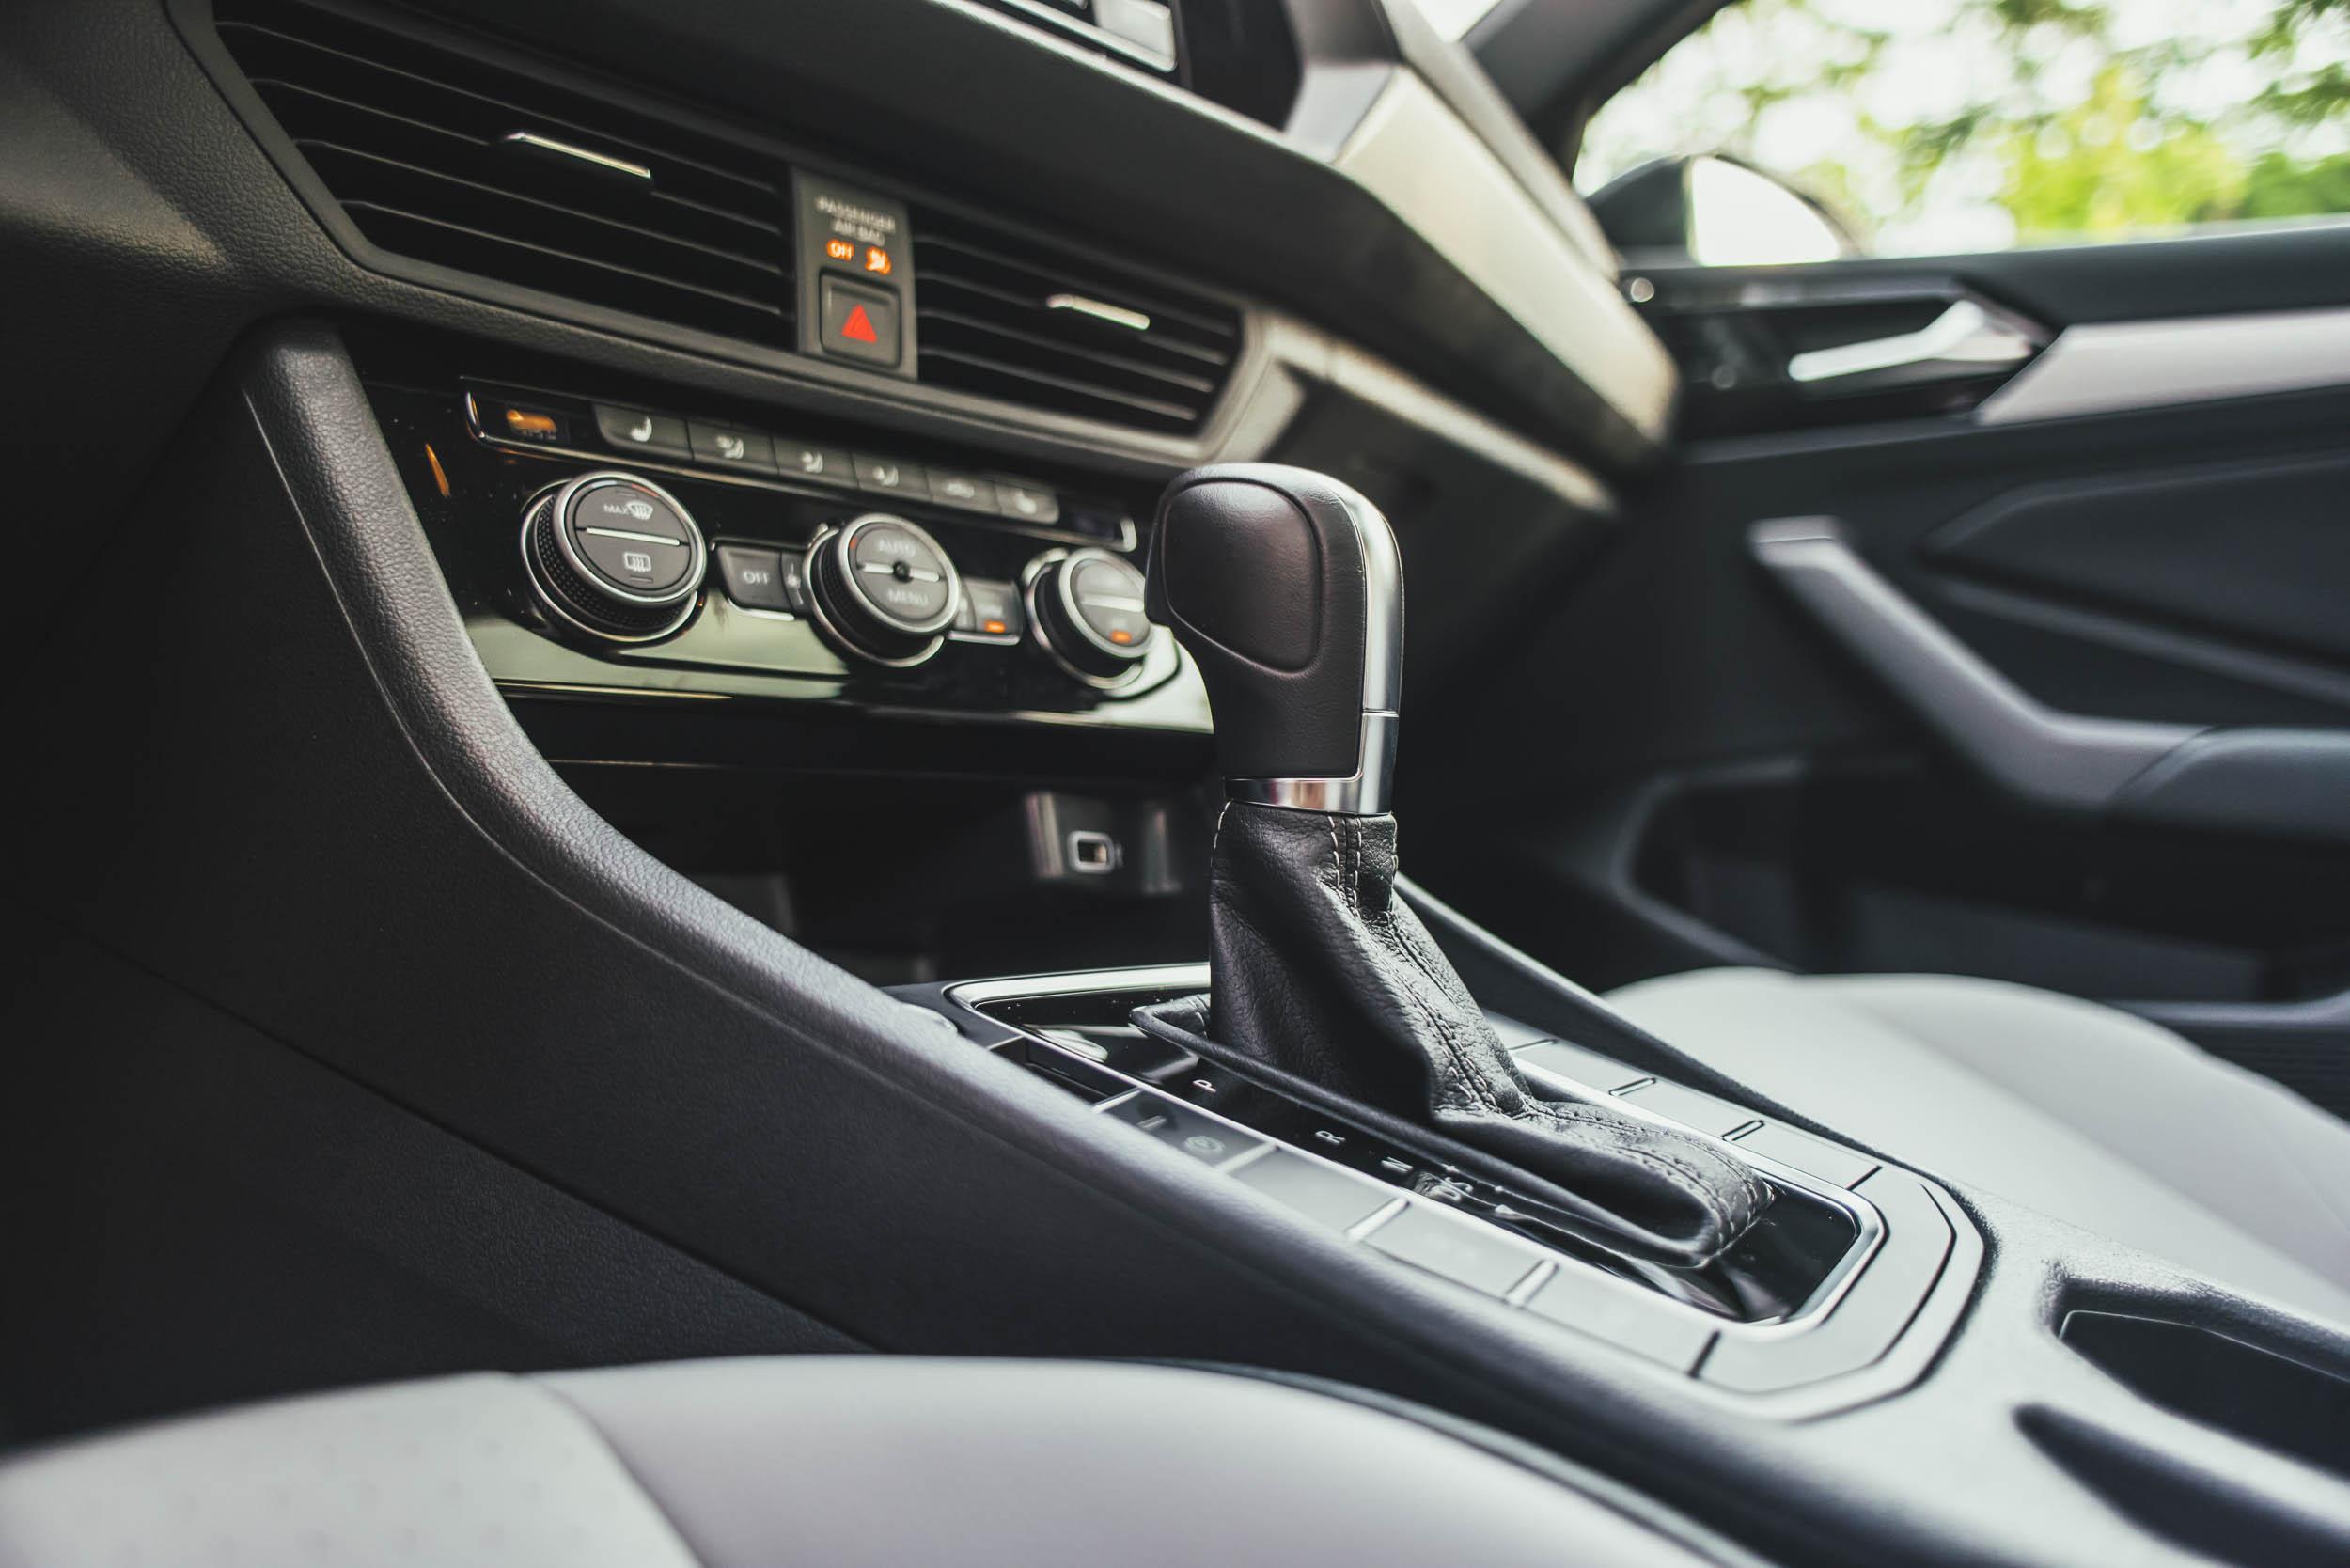 volkswagen jetta r-line gearshift